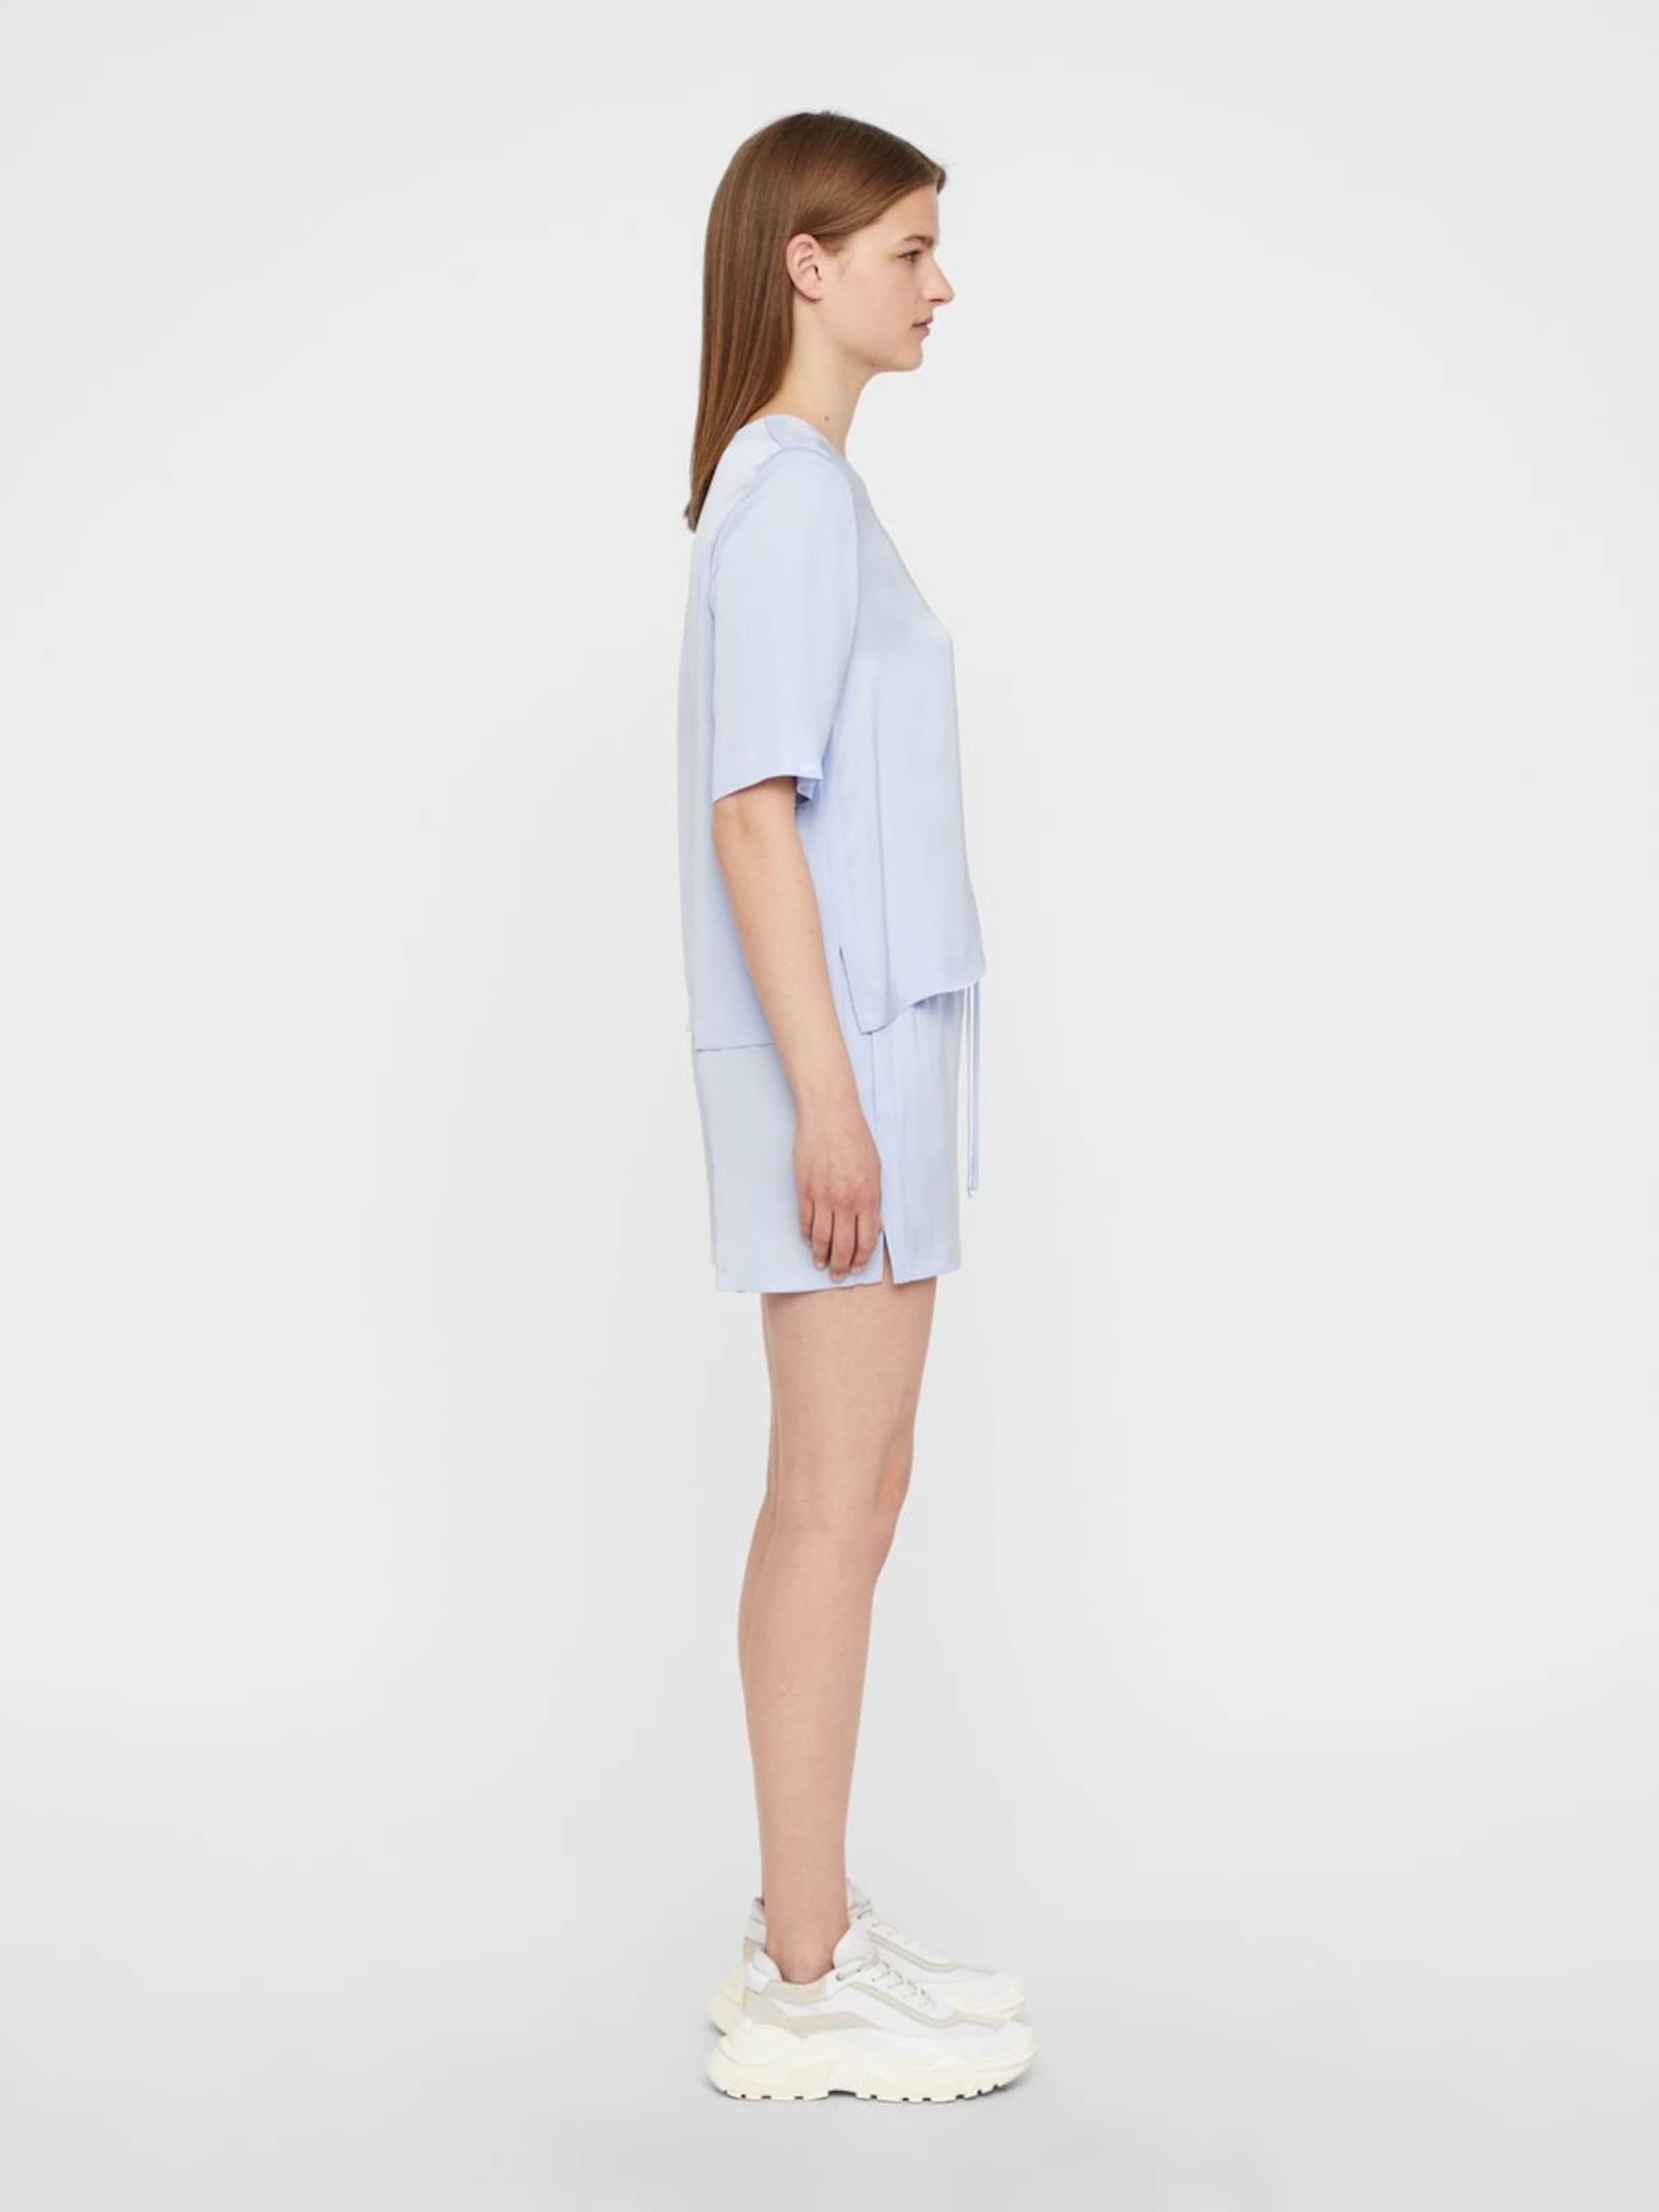 lindeberg Bleu En shirt 'jill' Clair J T EbeD2IWY9H